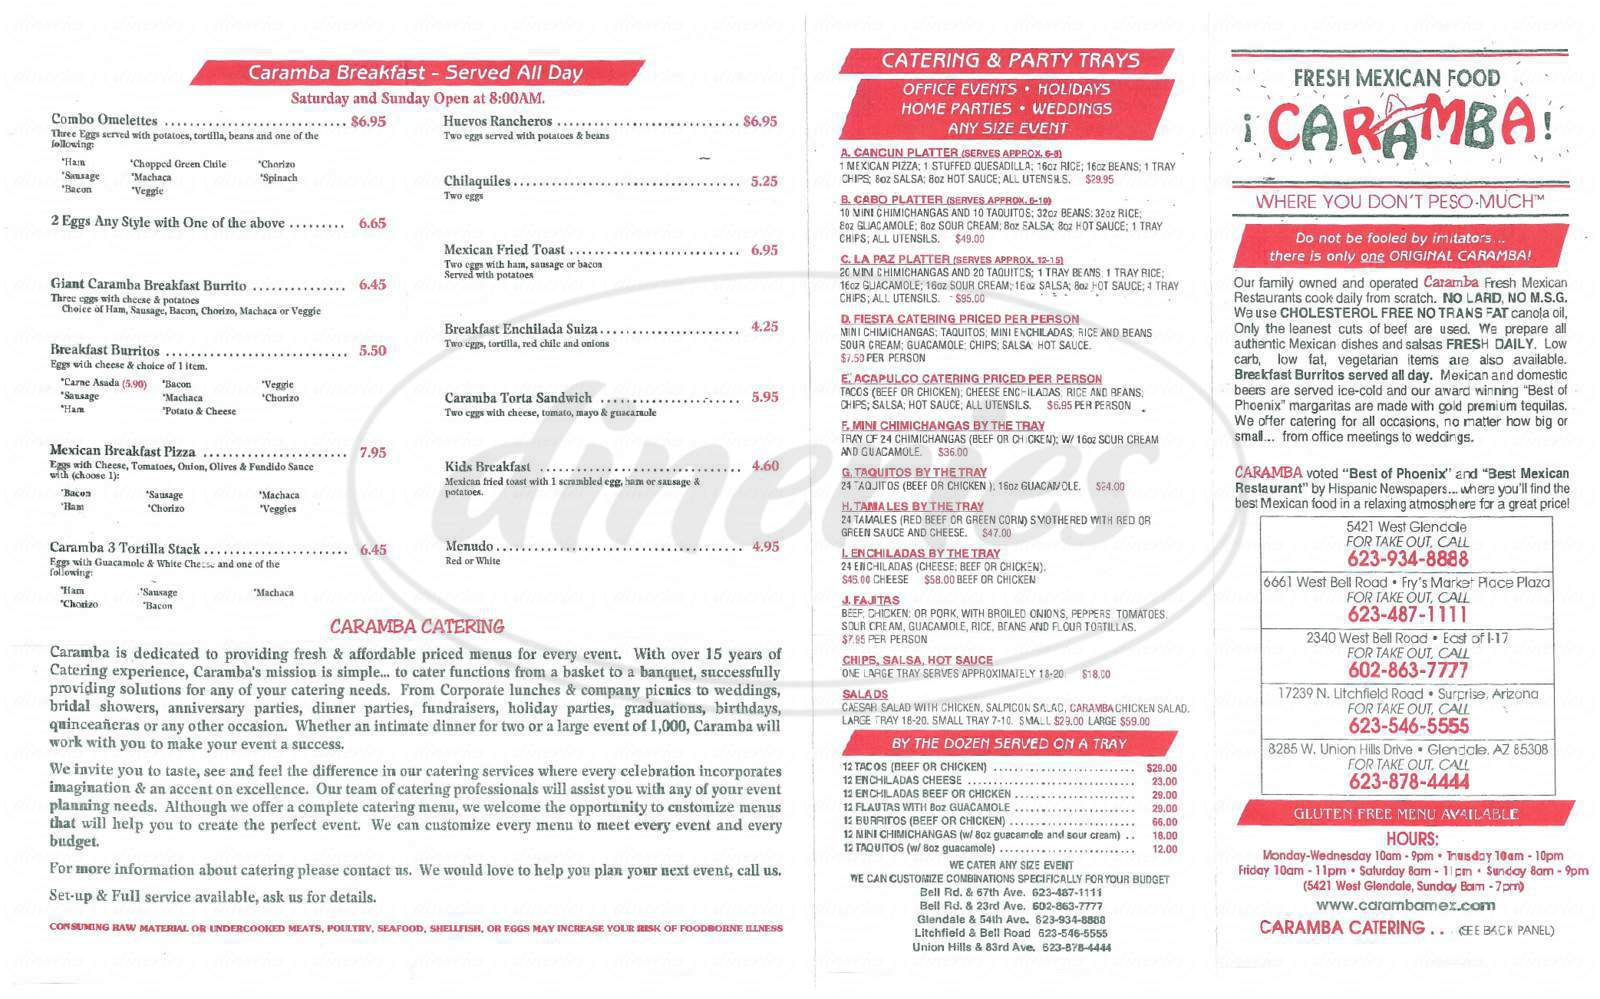 menu for Caramba Fresh Mexican Food